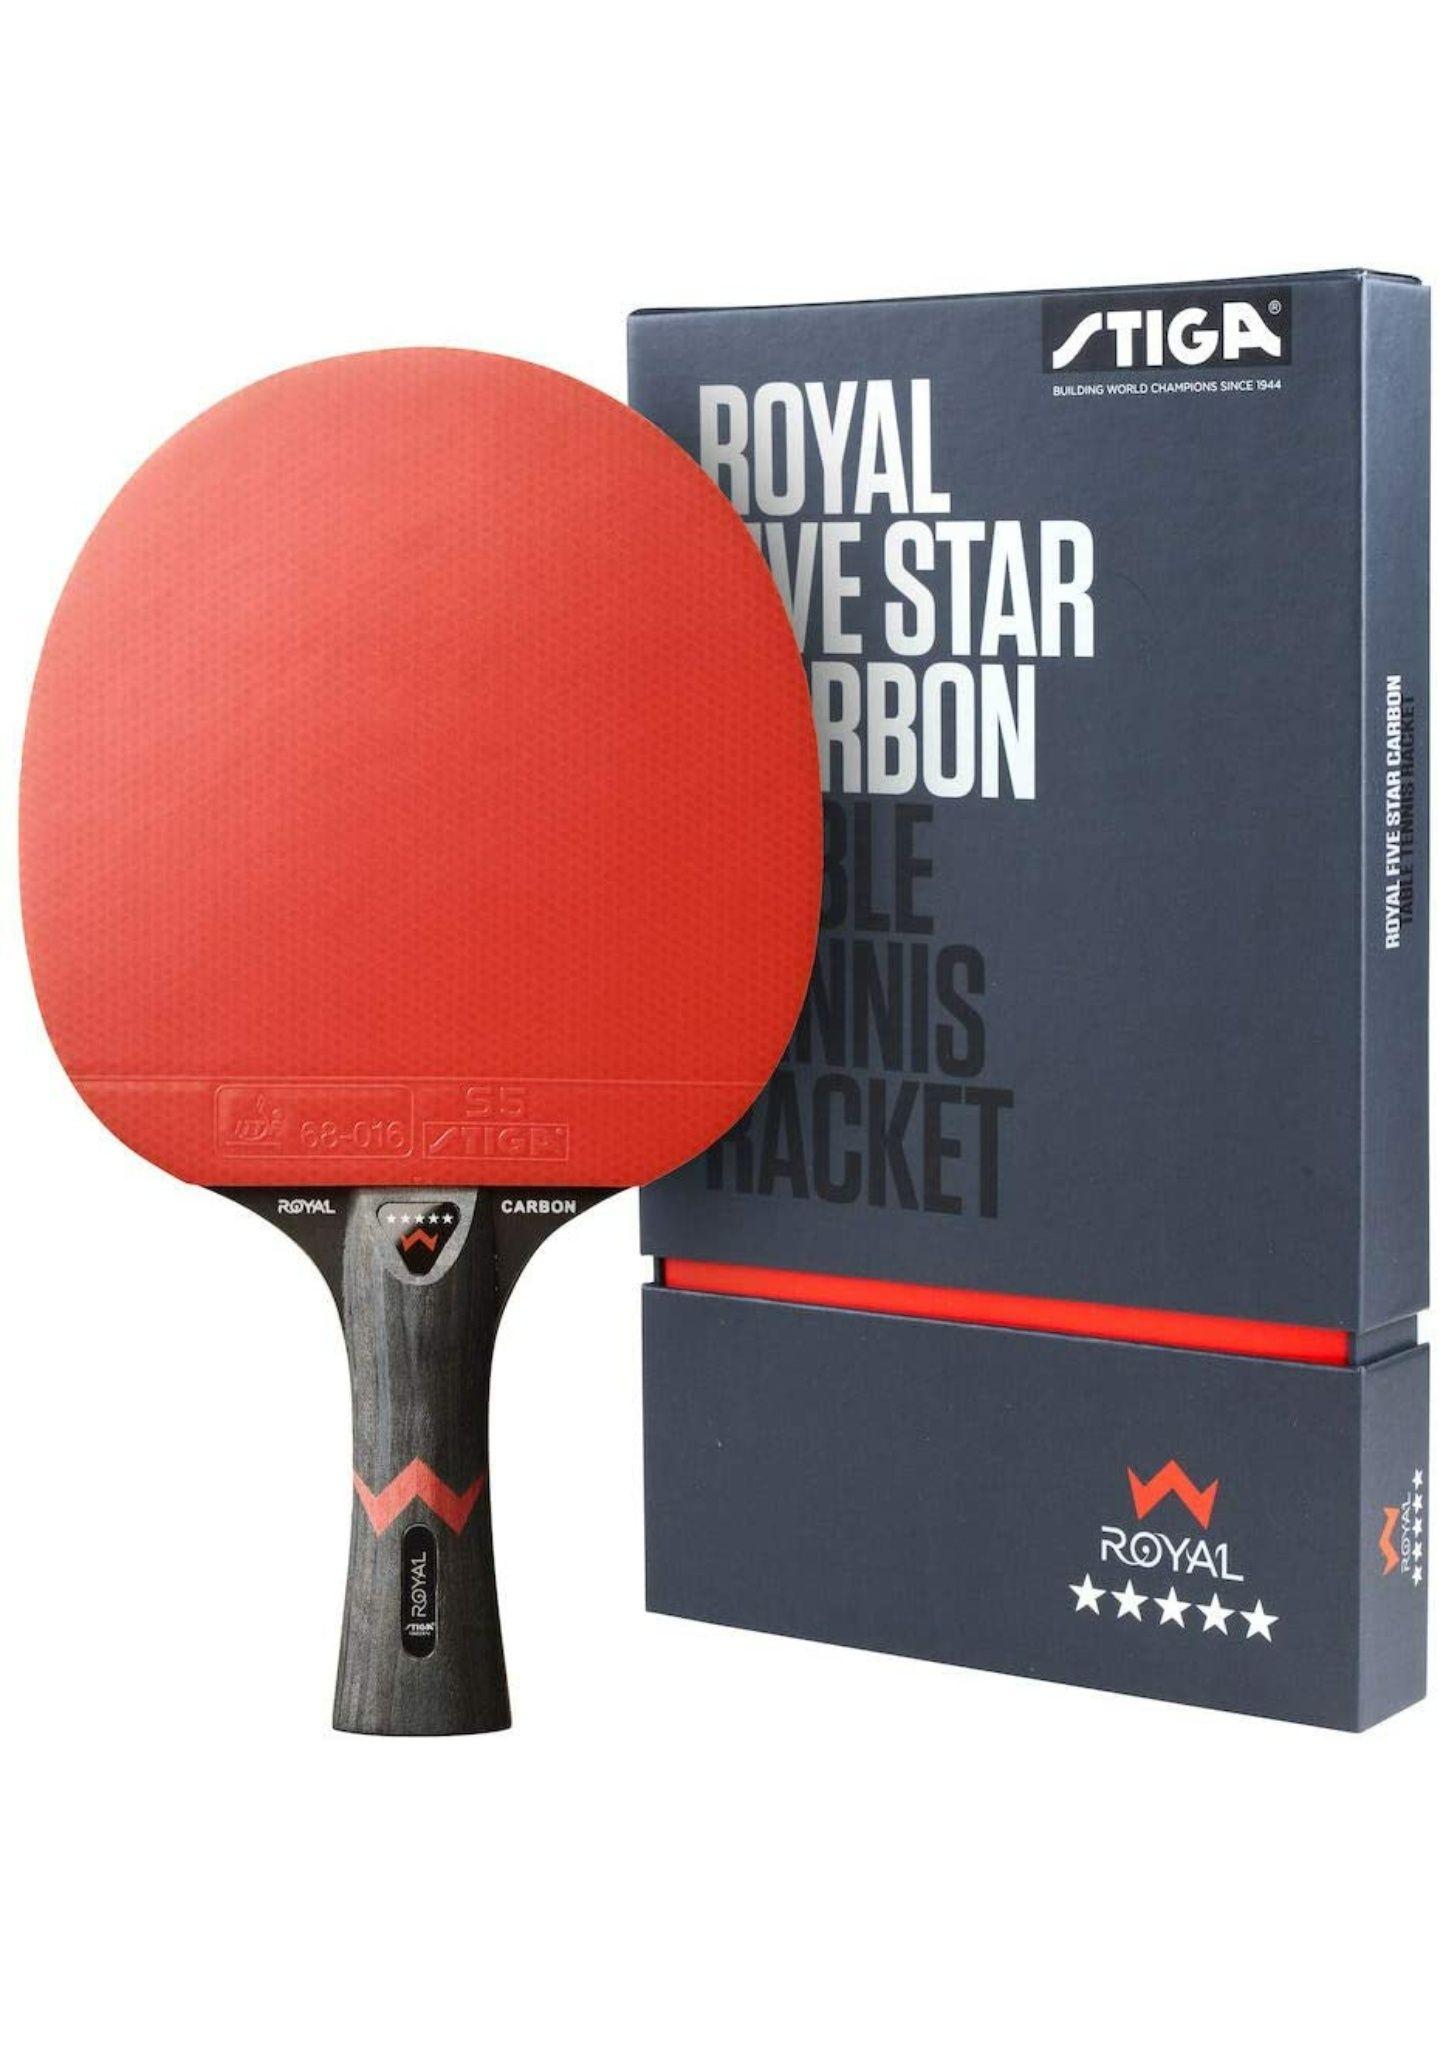 Stiga Royal 5-Star Table Tennis Pro Carbon Ping Pong Bat, Black/Red - £52.60 @ Amazon